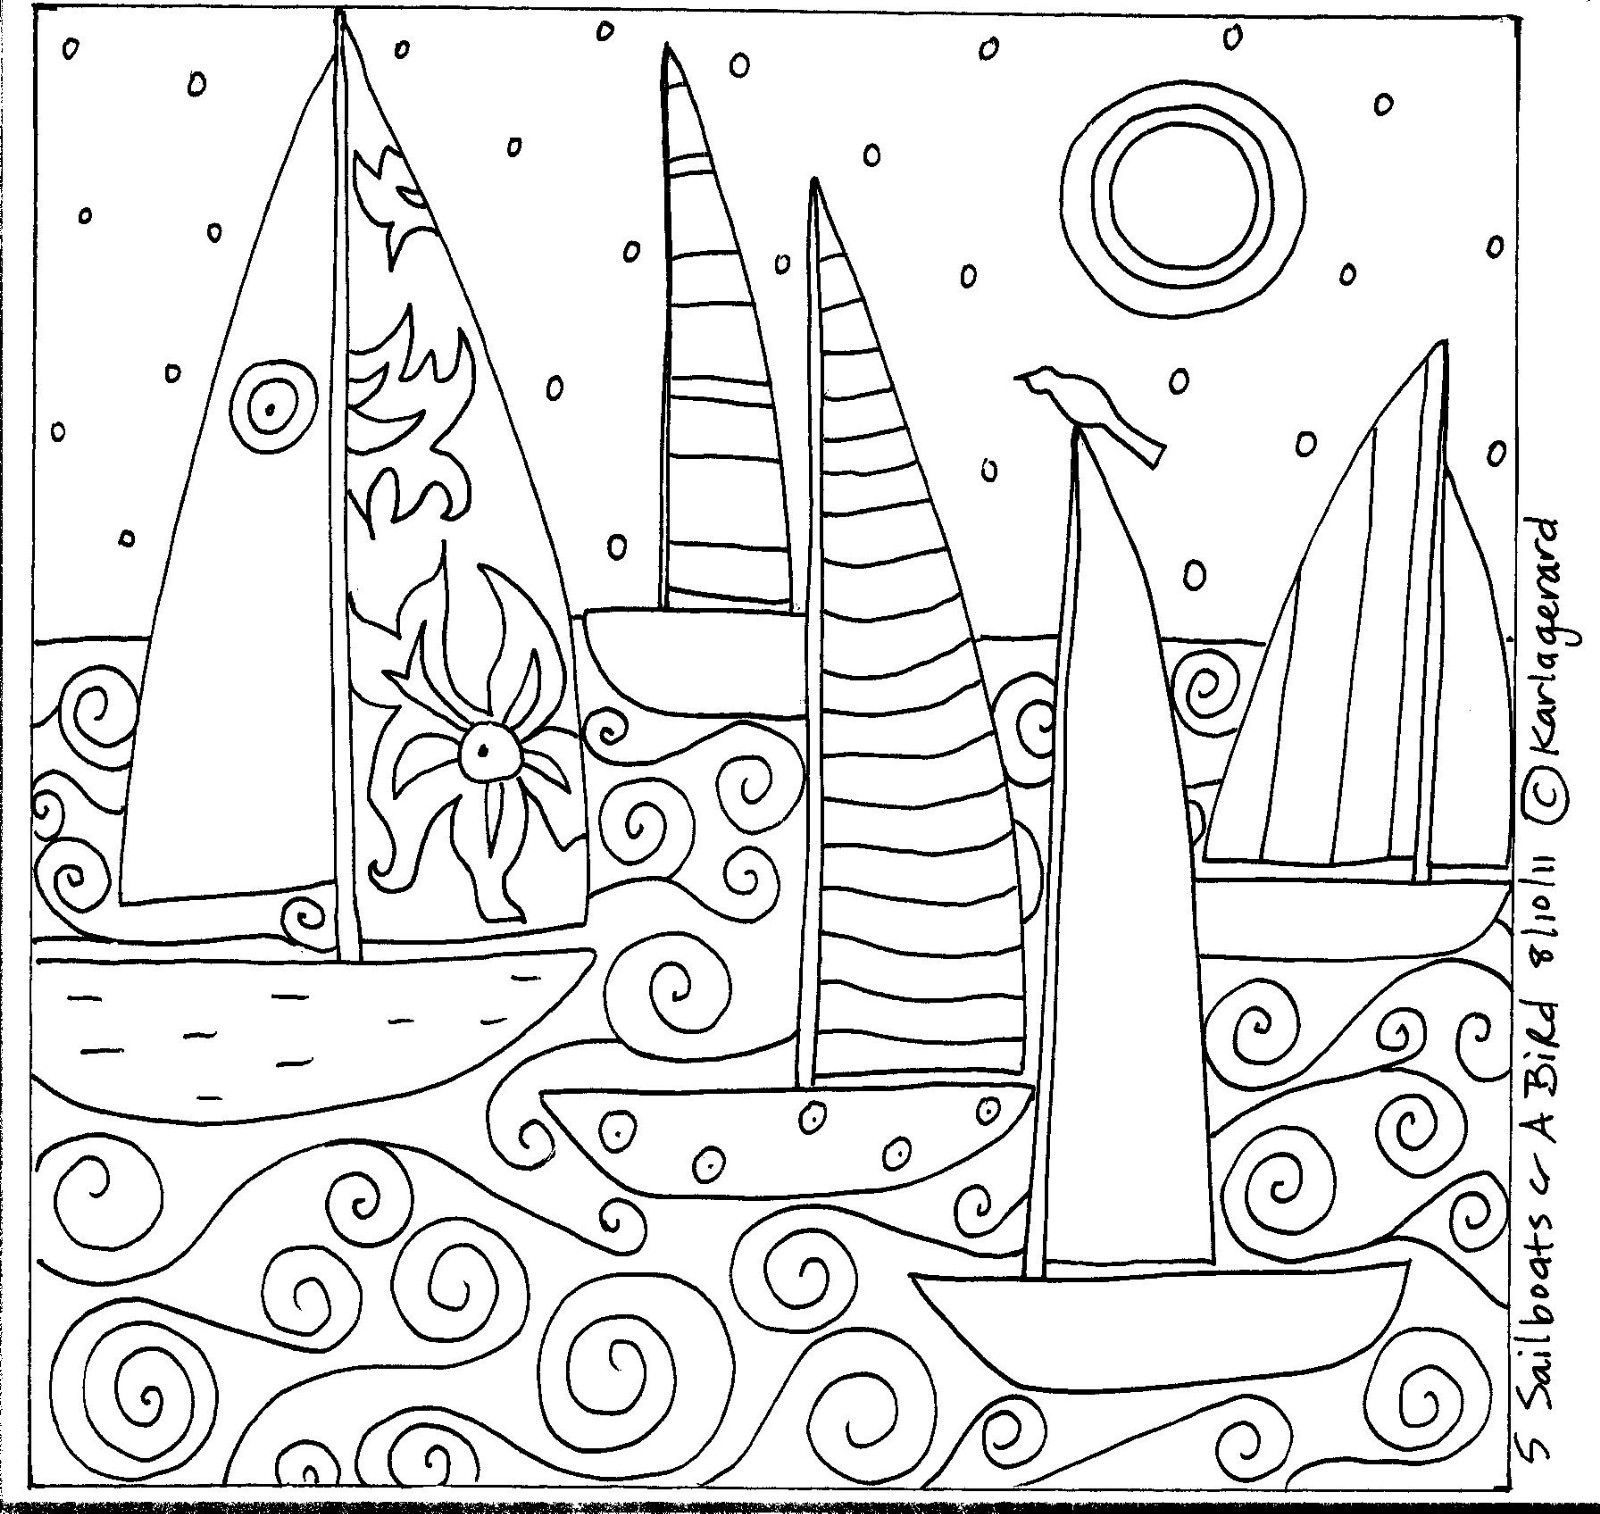 Rug Hook Paper Pattern 5 SAILBOATS & A BIRD Folk Art Abstract Primitive KARLA G #paperpatterns